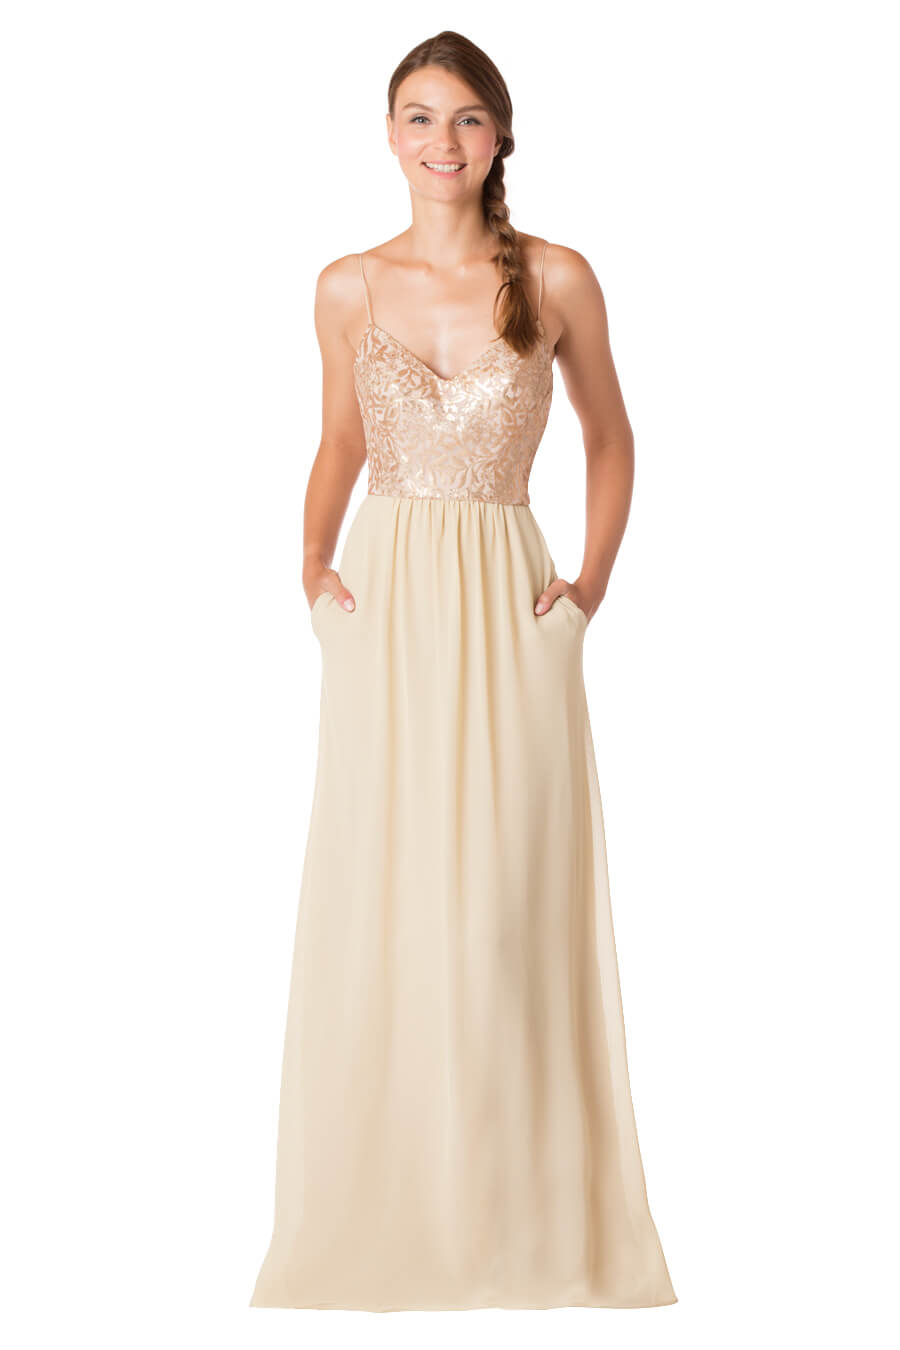 Bari jay bridesmaids bridesmaid dresses prom dresses formal bari jay 810 ombrellifo Image collections